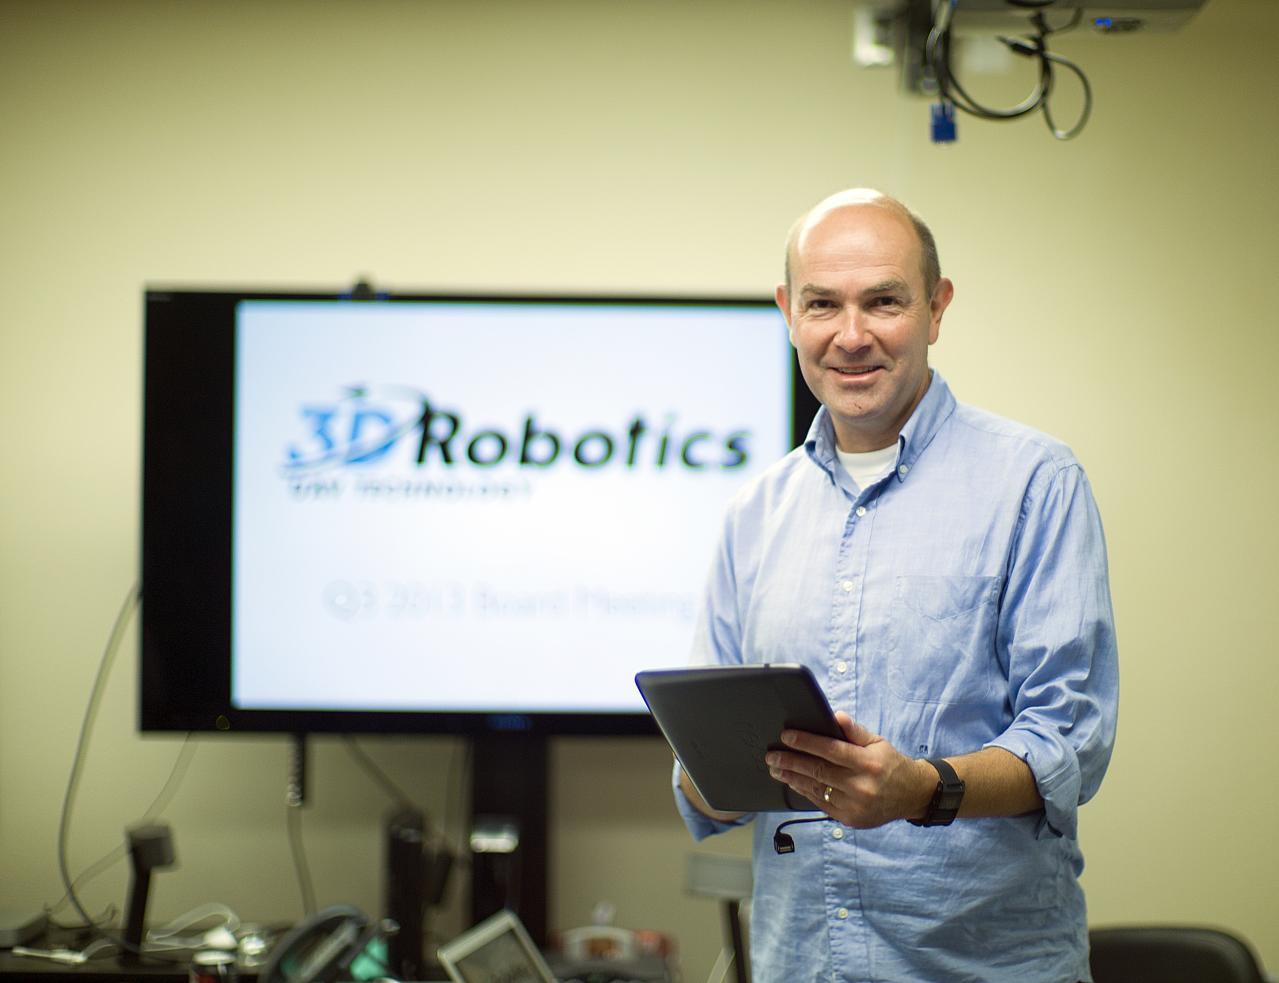 3D Robotics Fun, Christopher Michel August 5, 2013